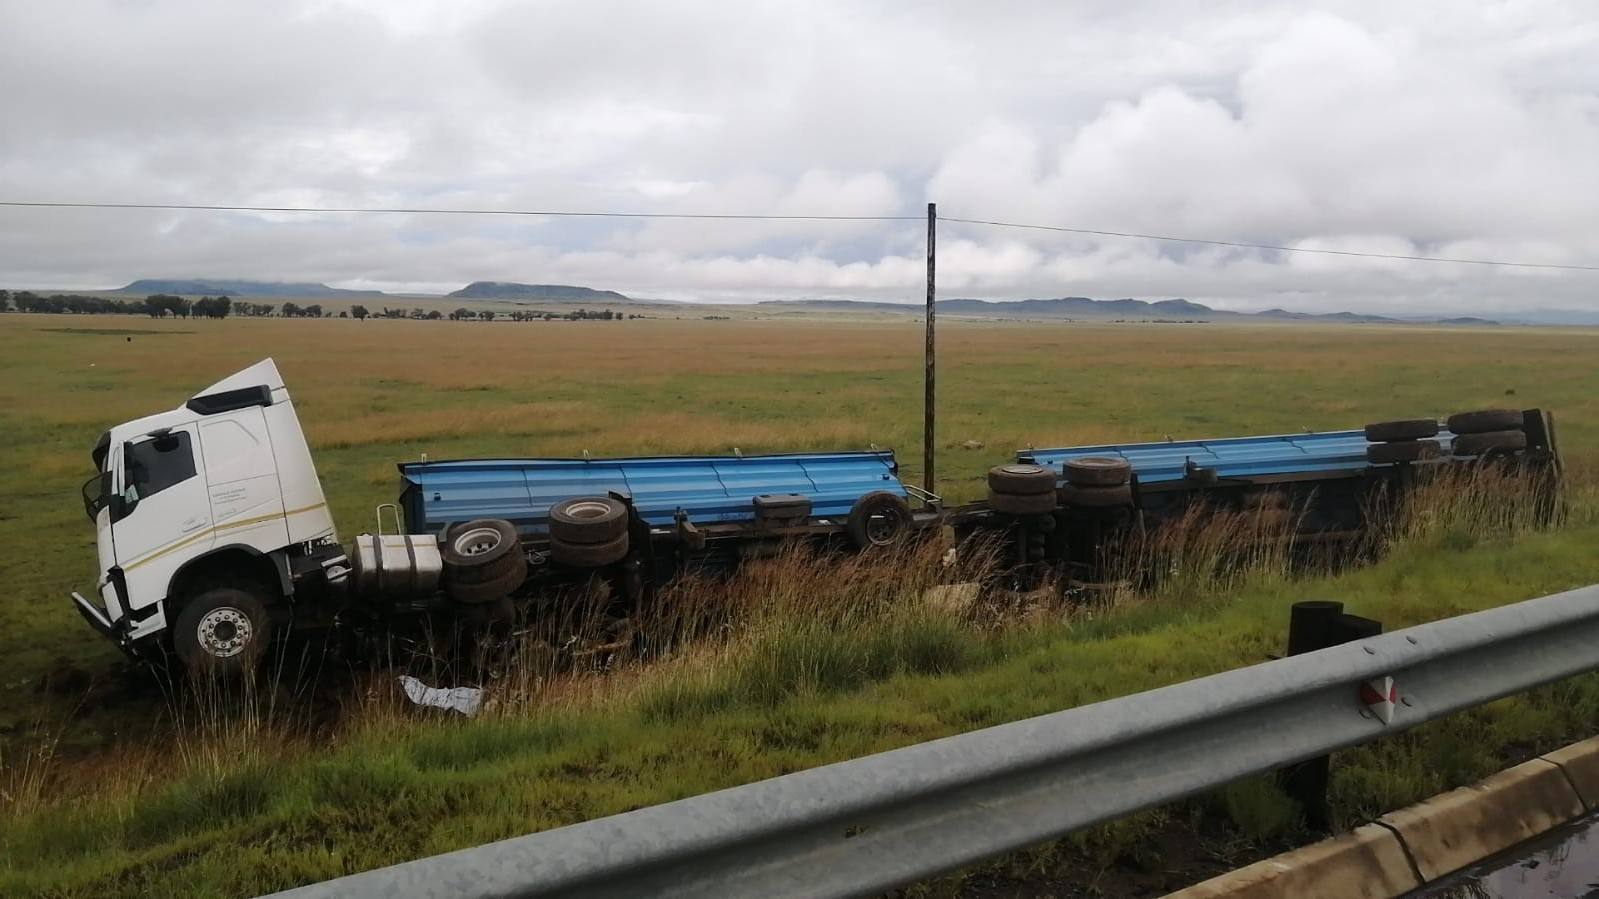 BMW in N8 Botshabelo fatal crash threw itself into the truck's path, says witness